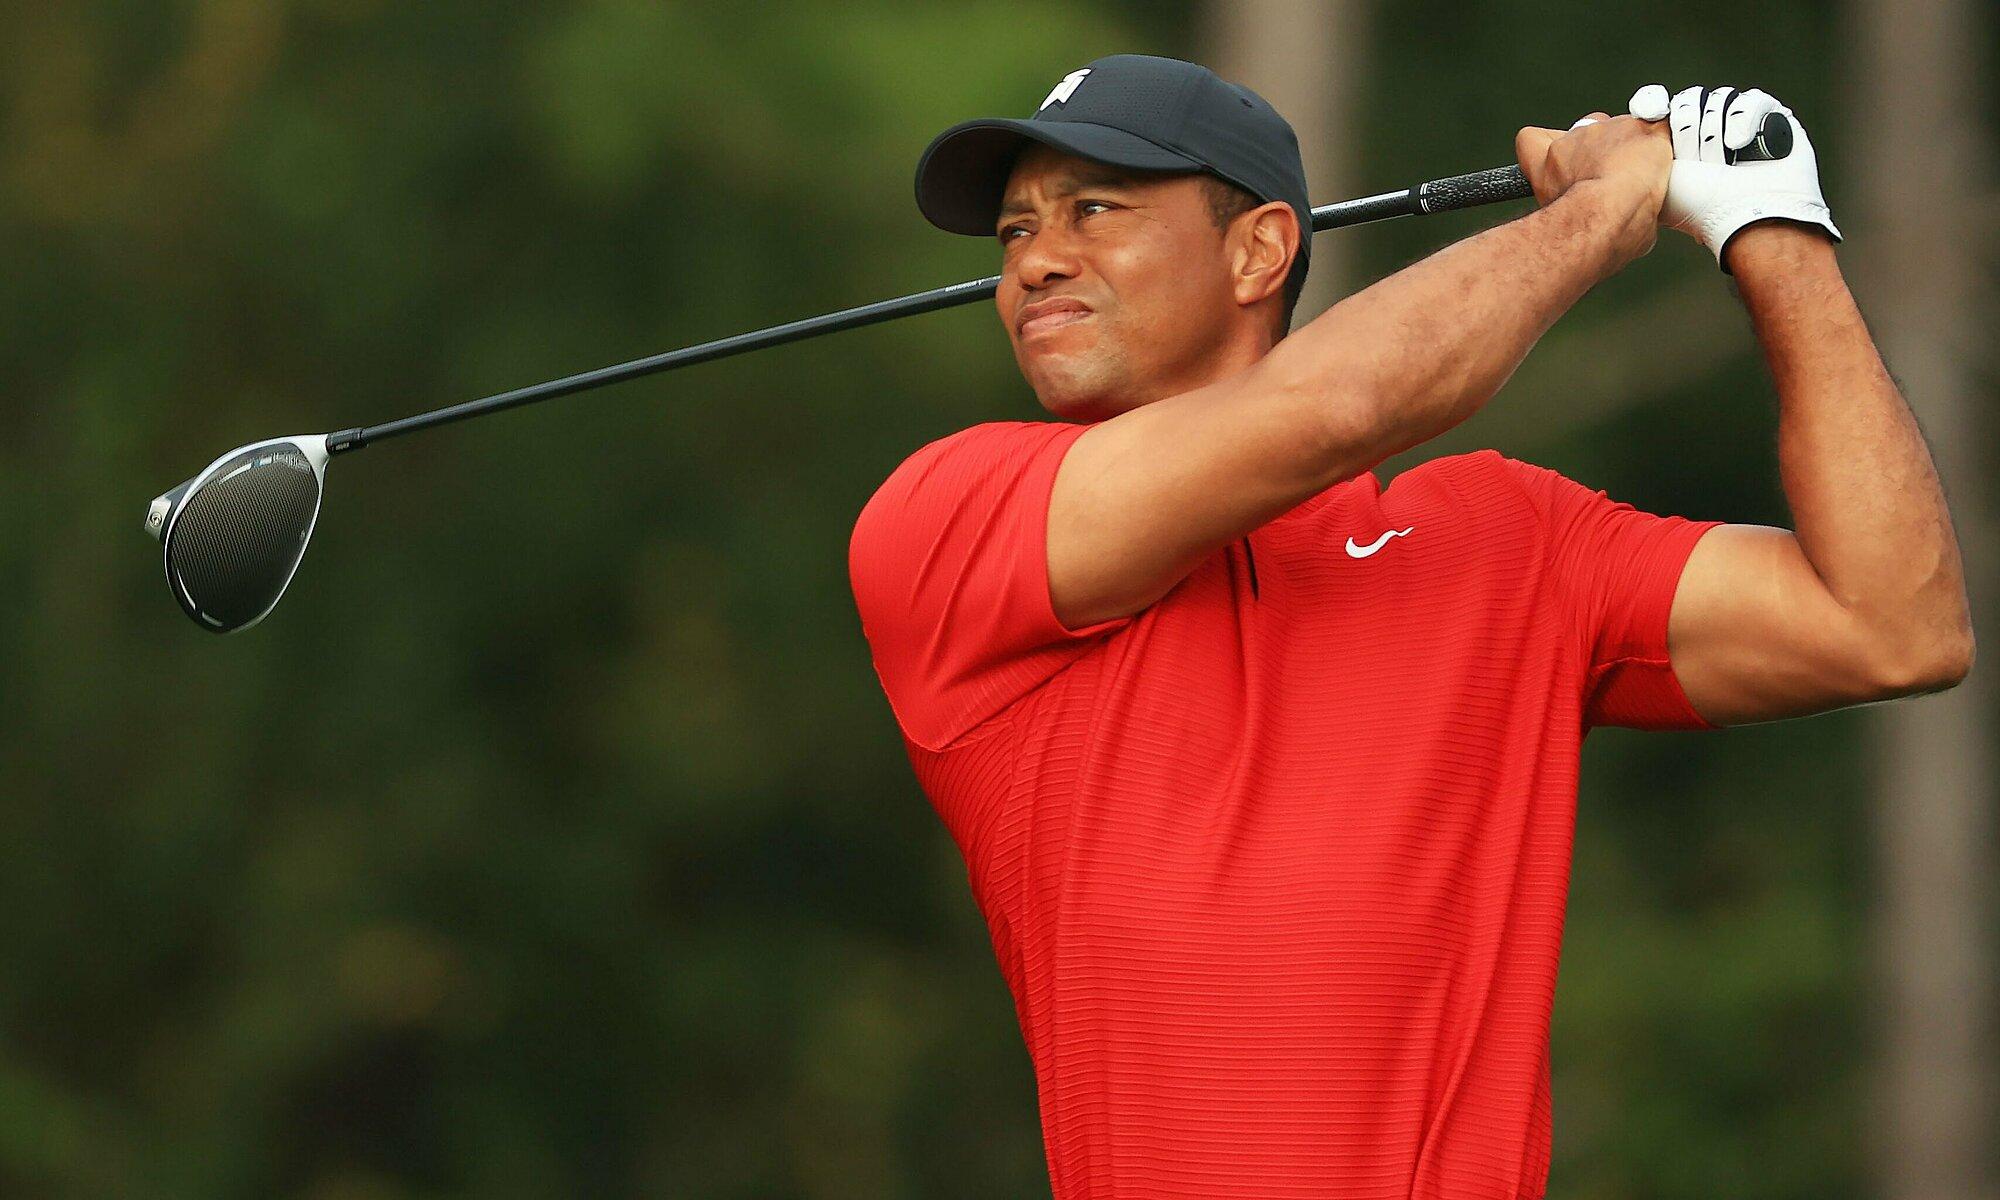 Woods akan memasuki masa terapi dan pemulihan setelah pulang ke Florida.  Foto: Golf Digest